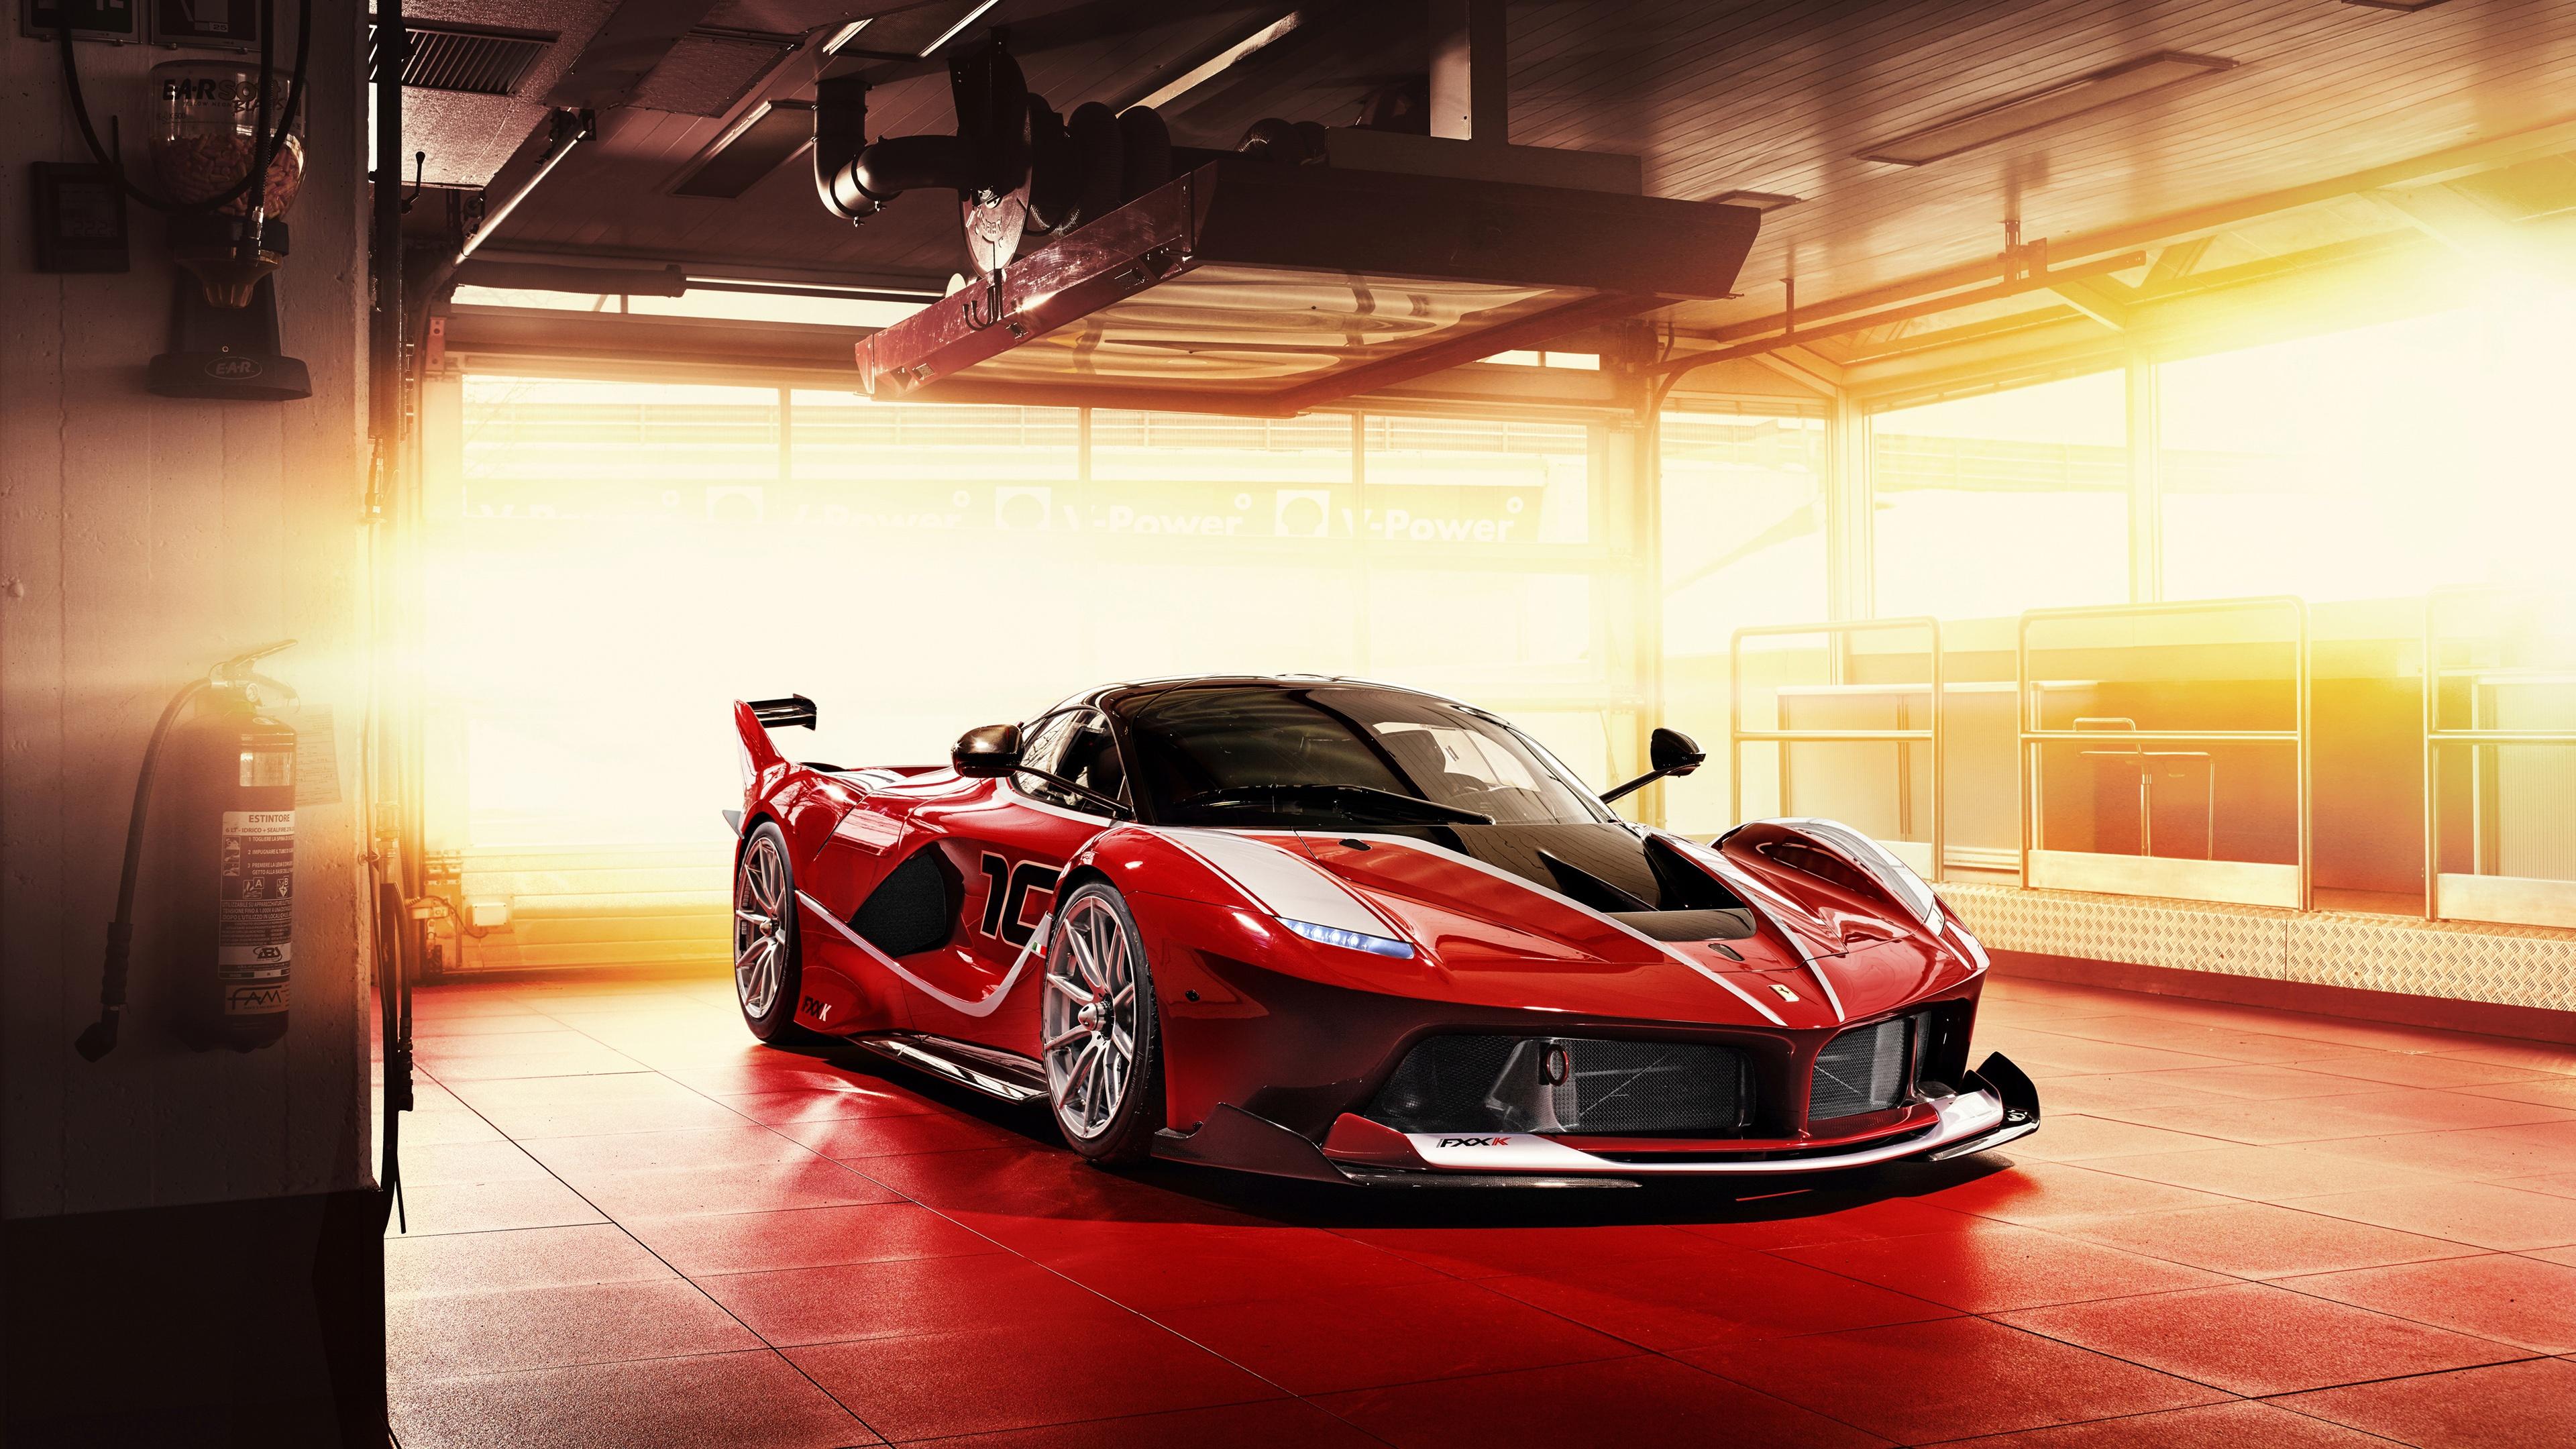 Ferrari Fxx K 2015 Wallpapers In Jpg Format For Free Download